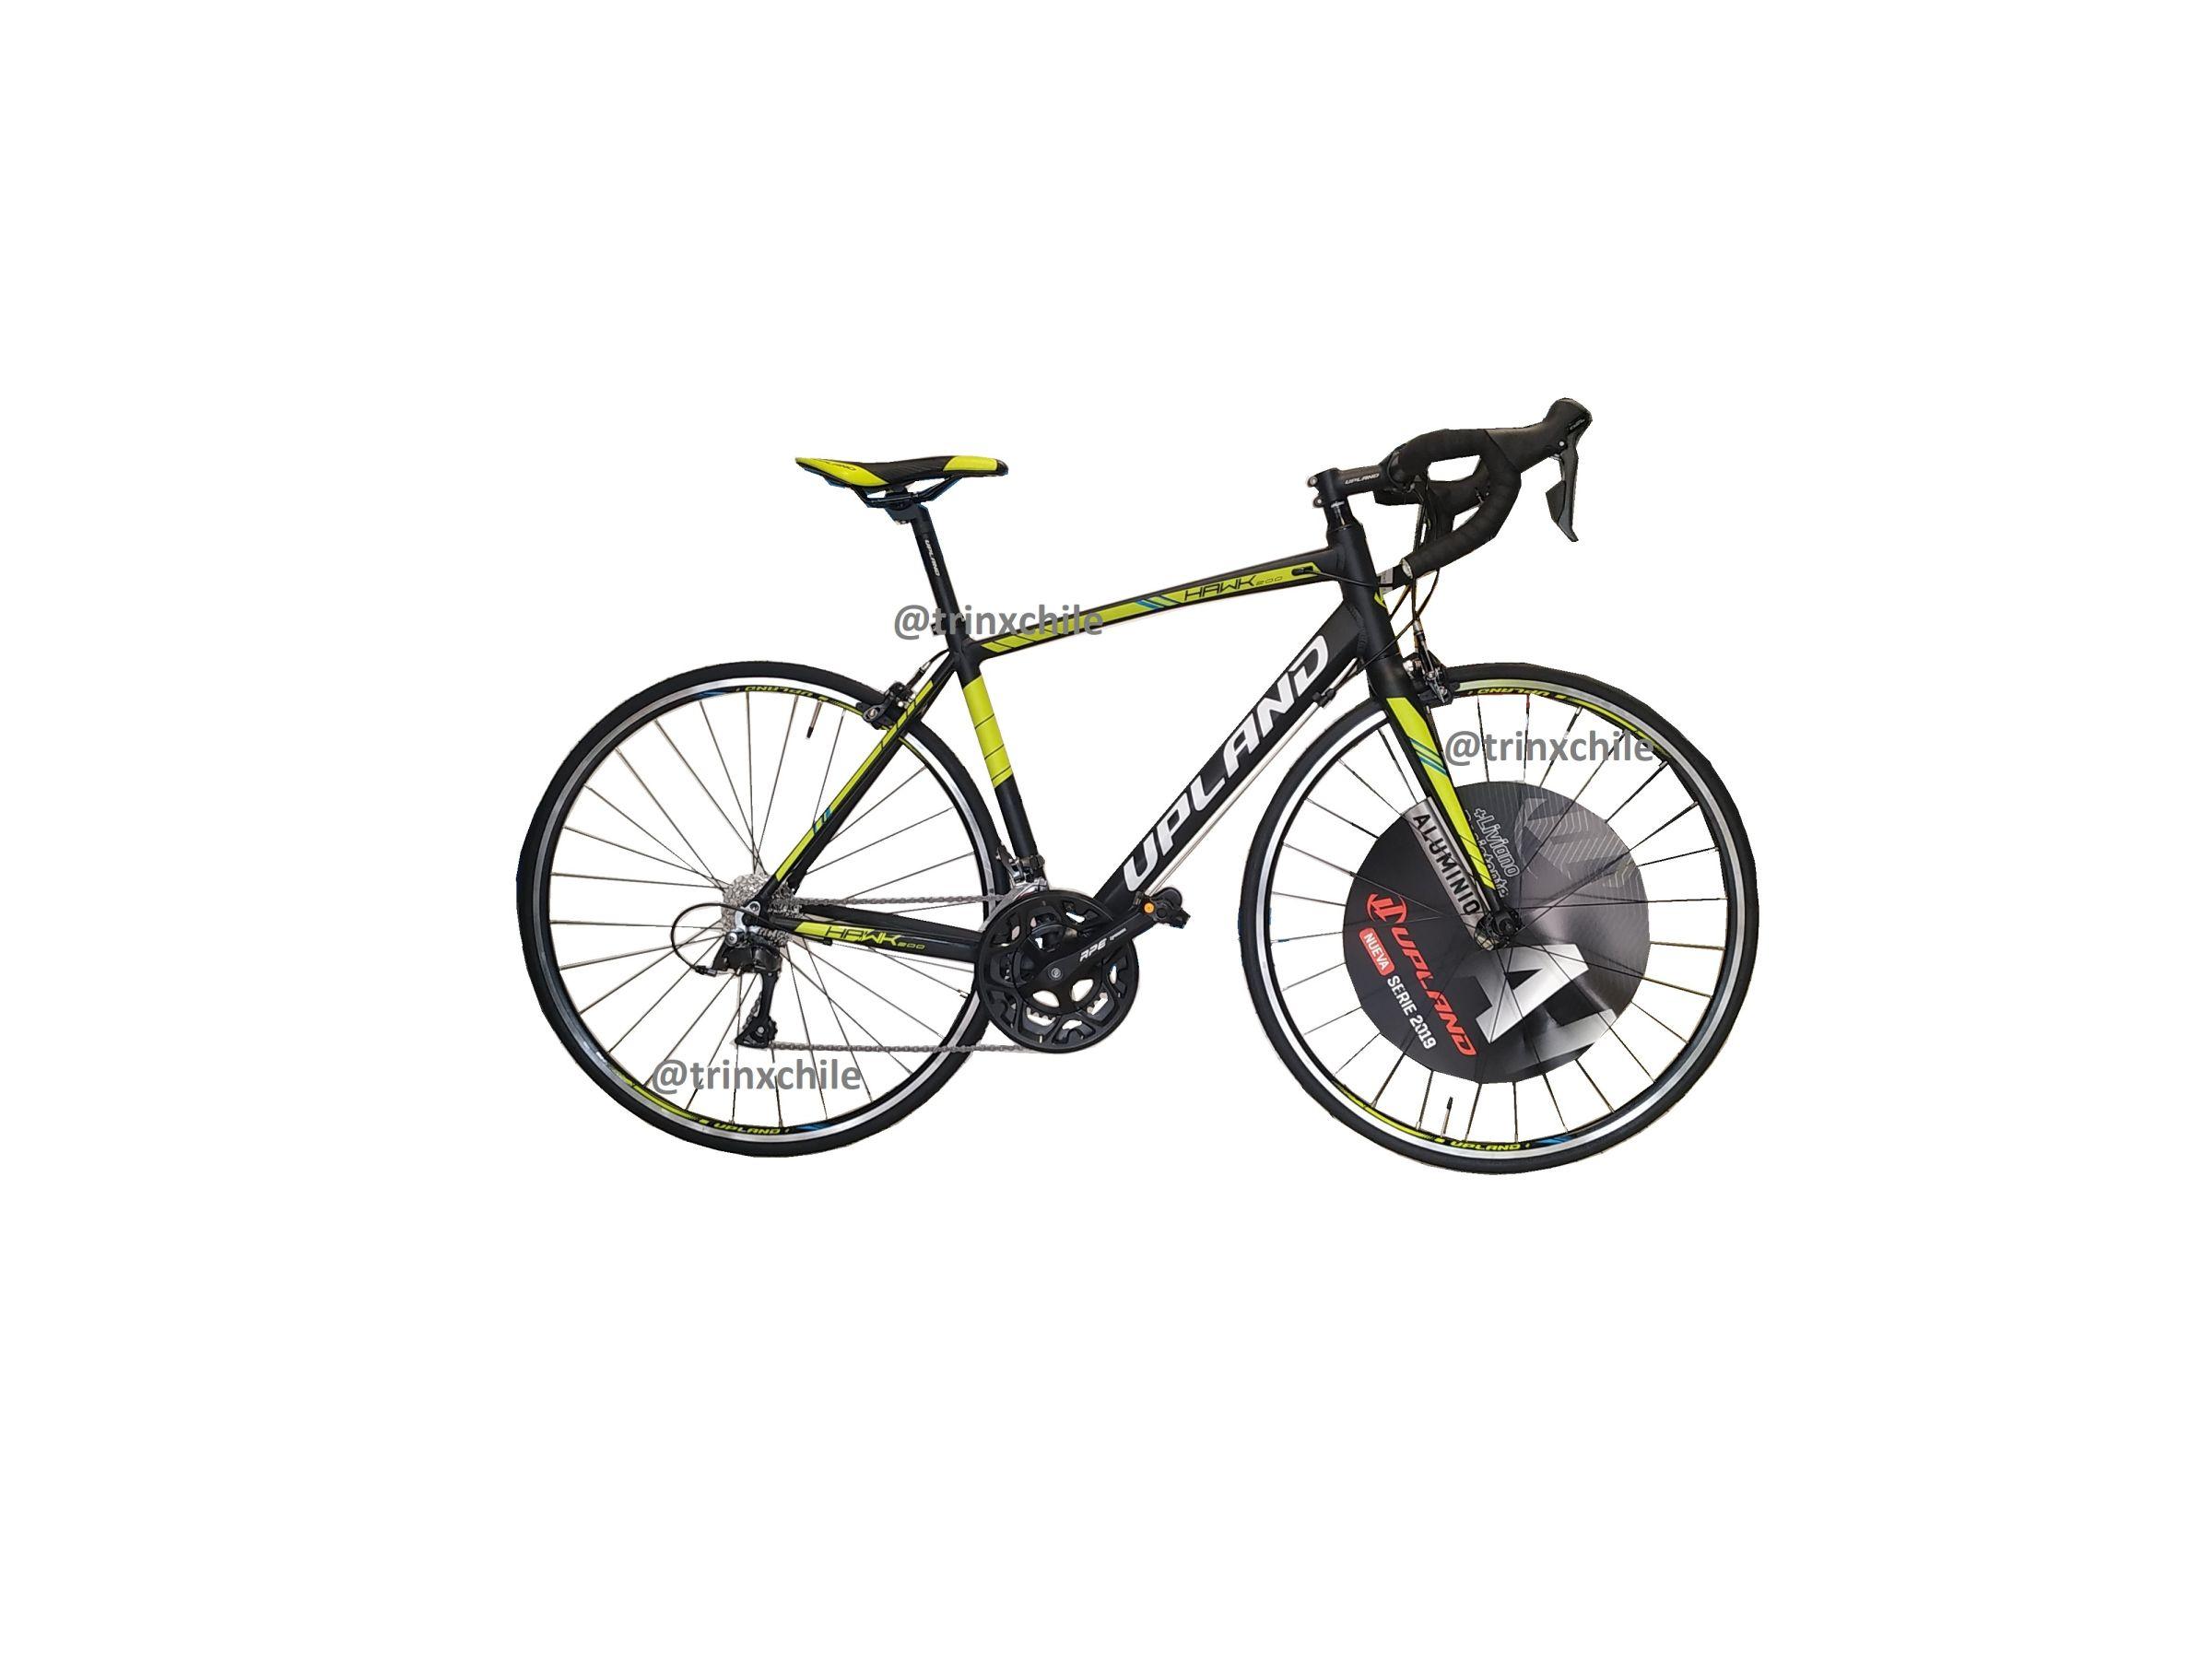 Bicicleta Upland Hawk 200 19